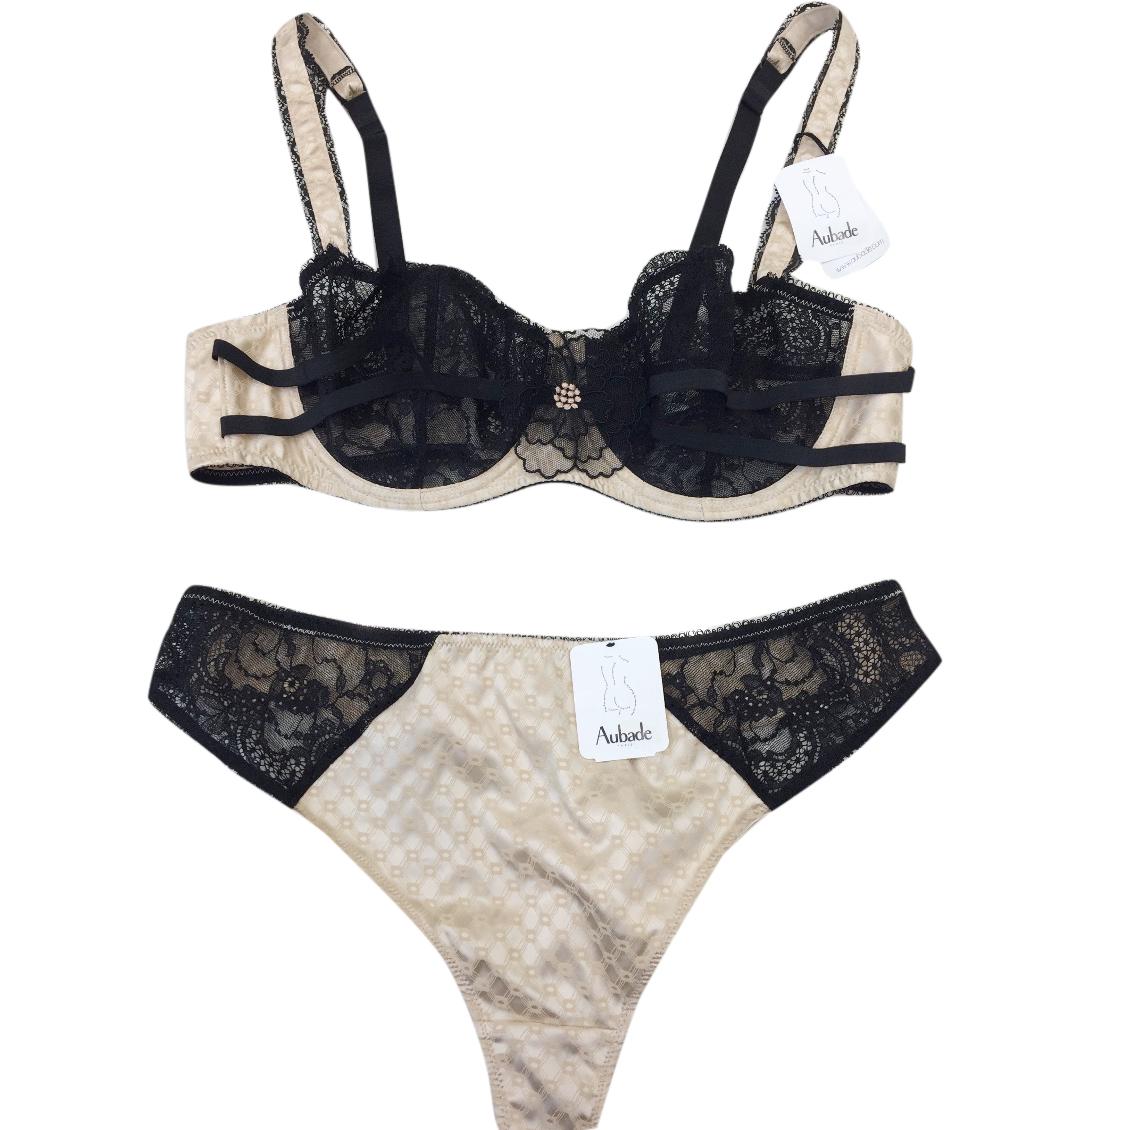 4b214f45bd Aubade Pearl Satin Jacquard Black Lace Underwired Bra Tanga Set ...